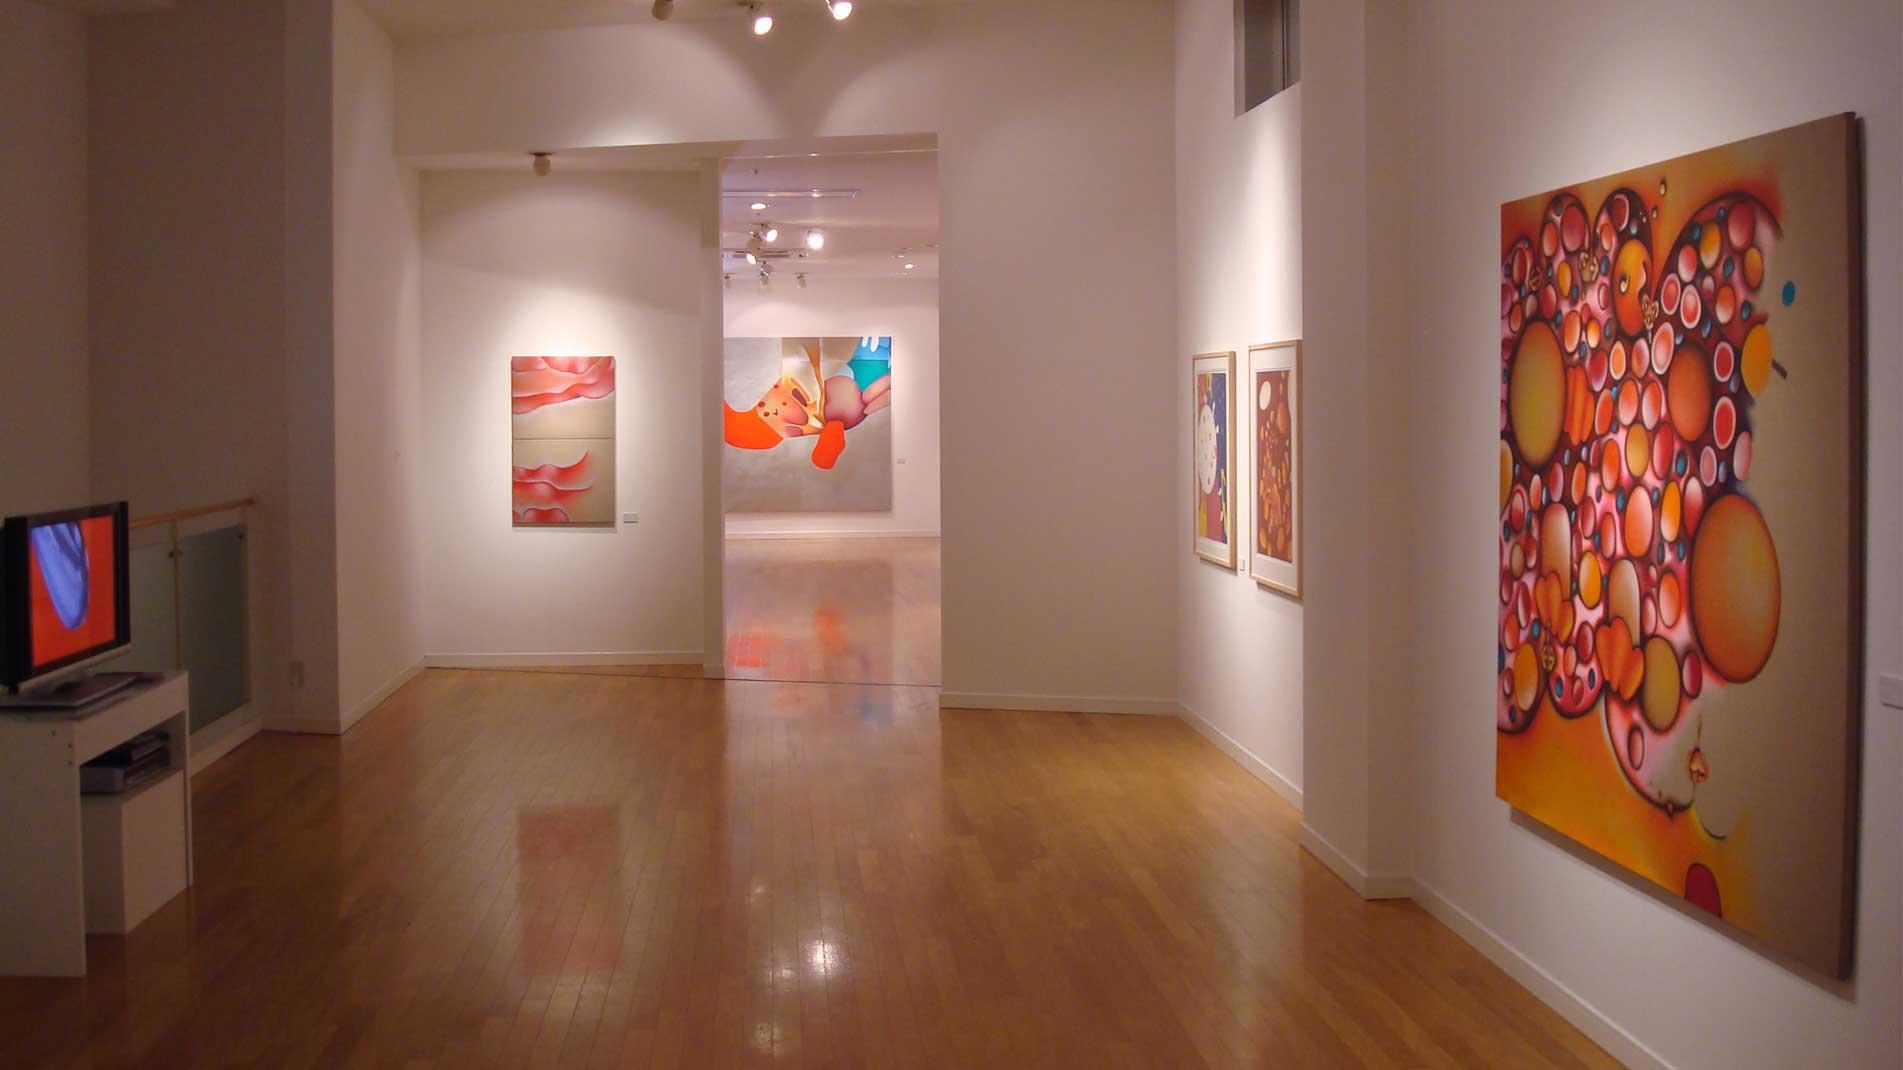 Bottazzi, exposition au musée Miyanomori, Japon, 2011